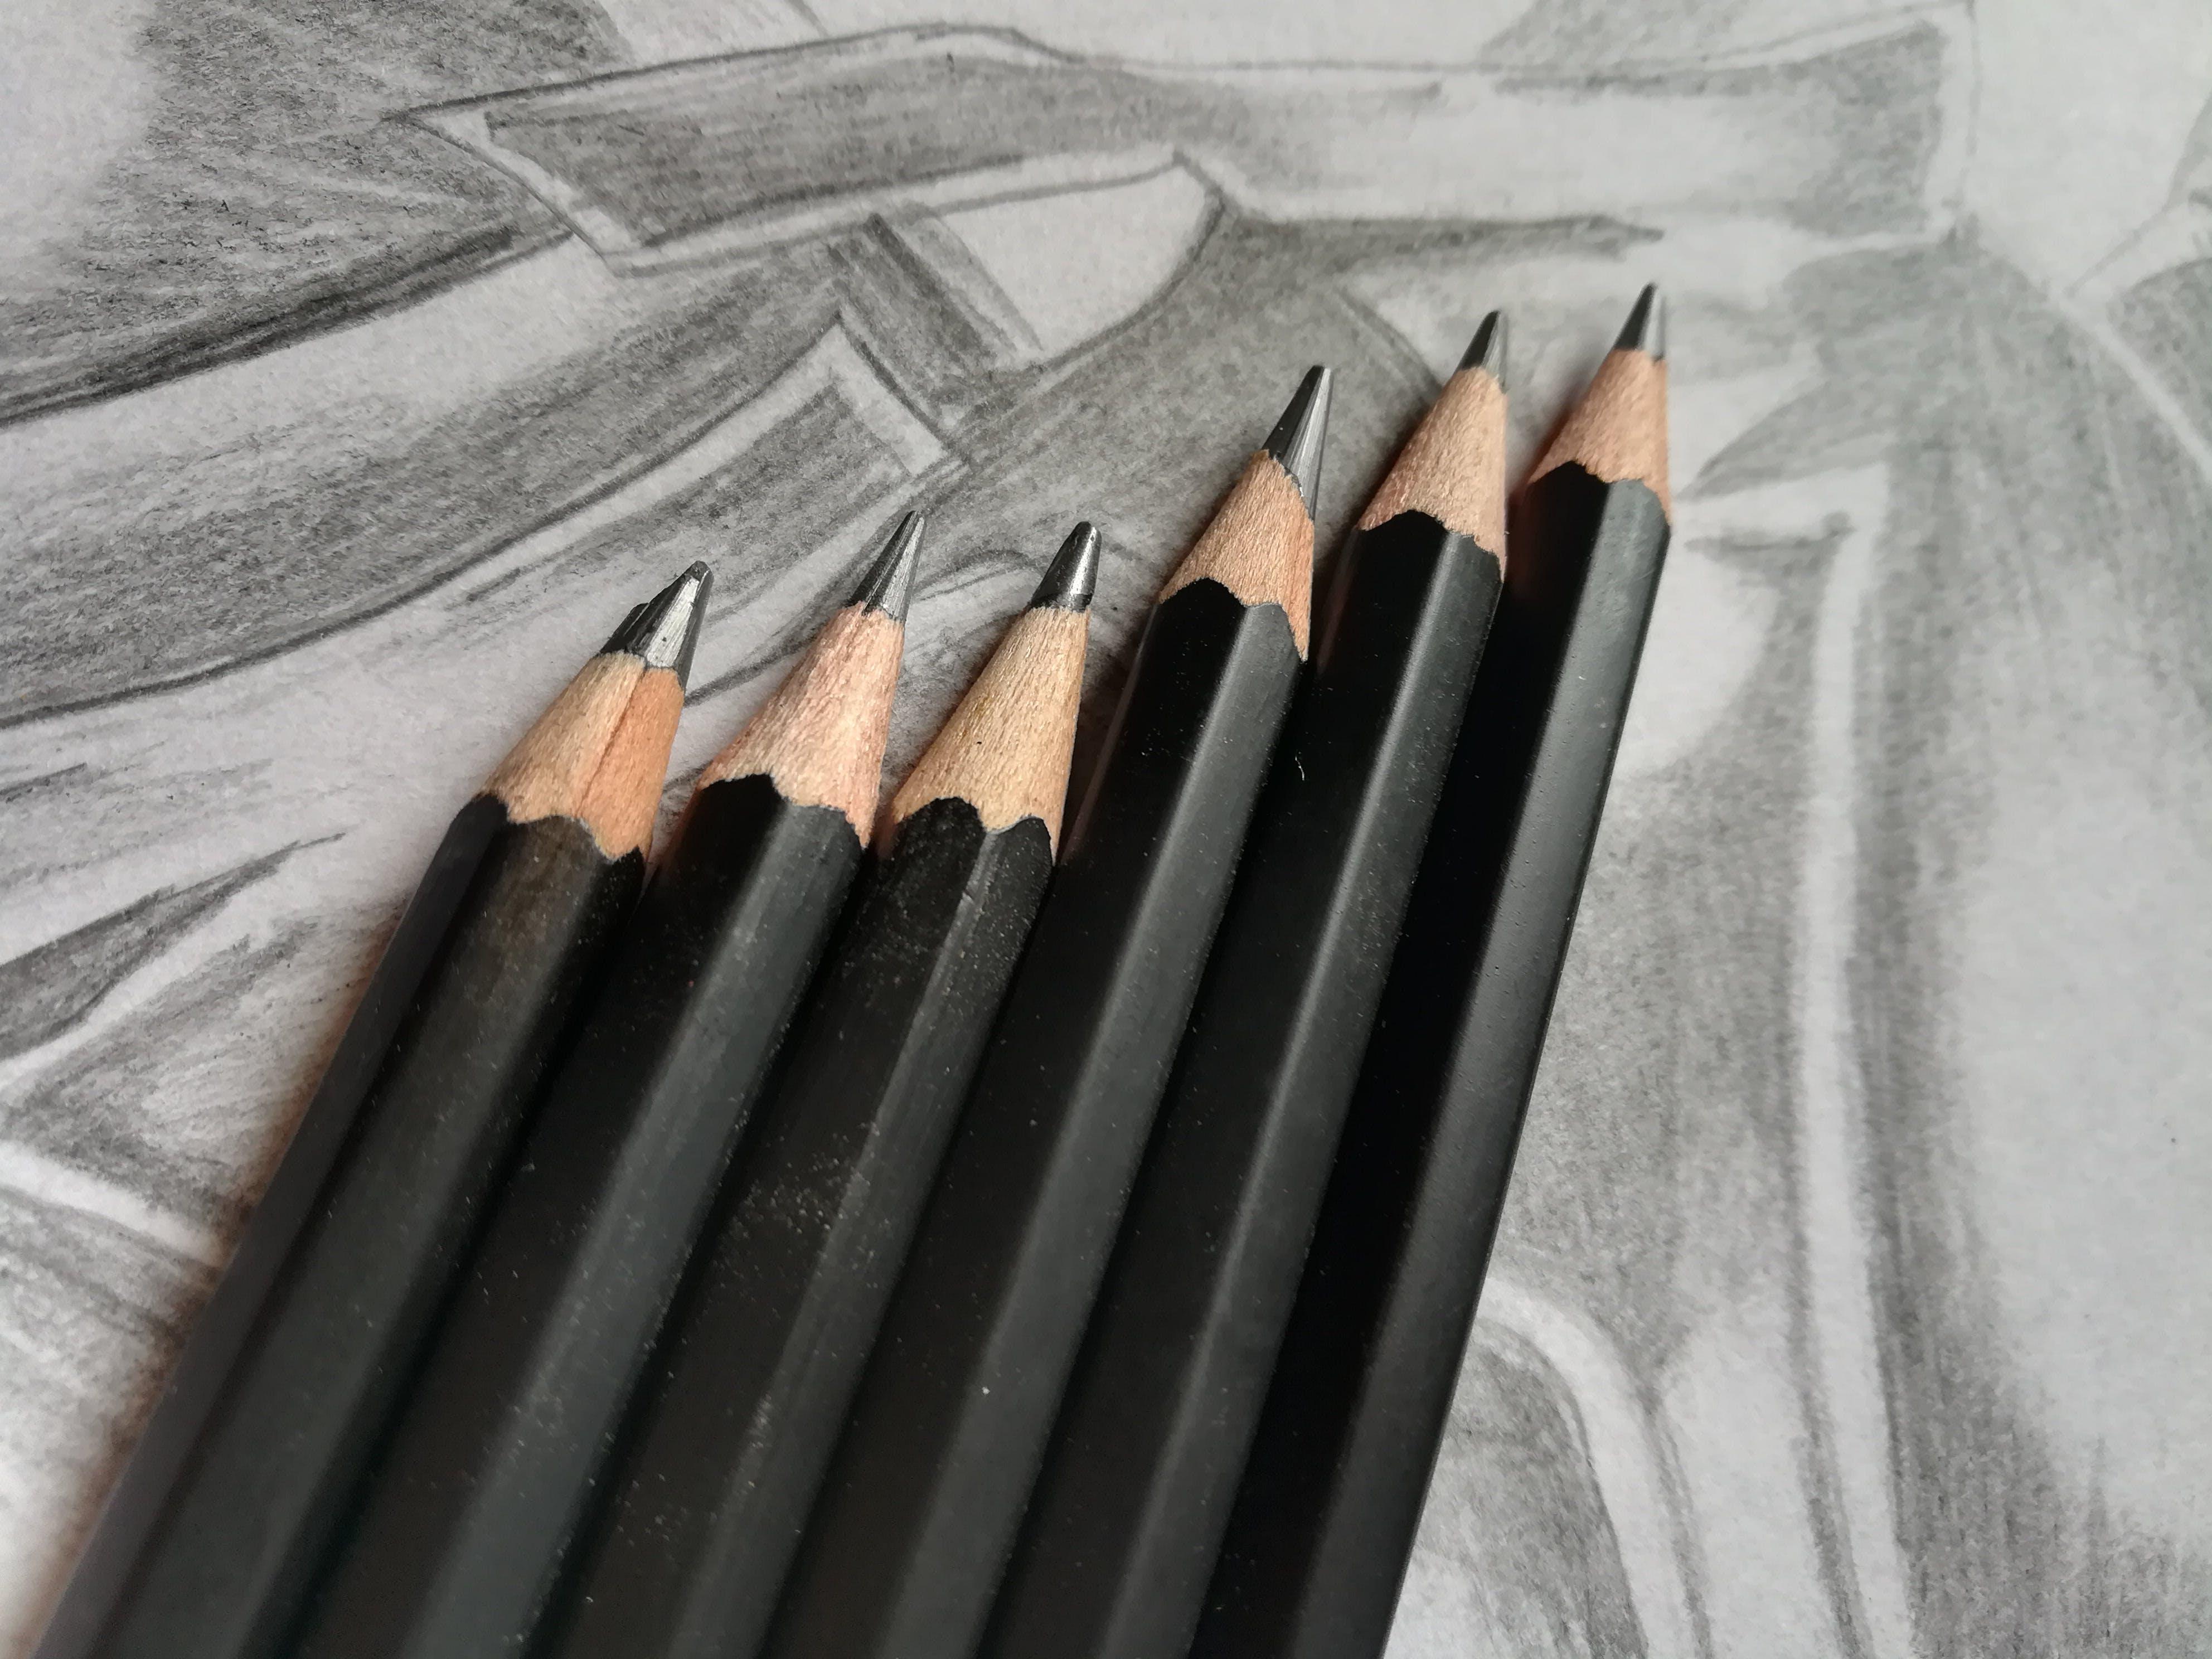 Free stock photo of artistic, Black matta, black pencils, book pages